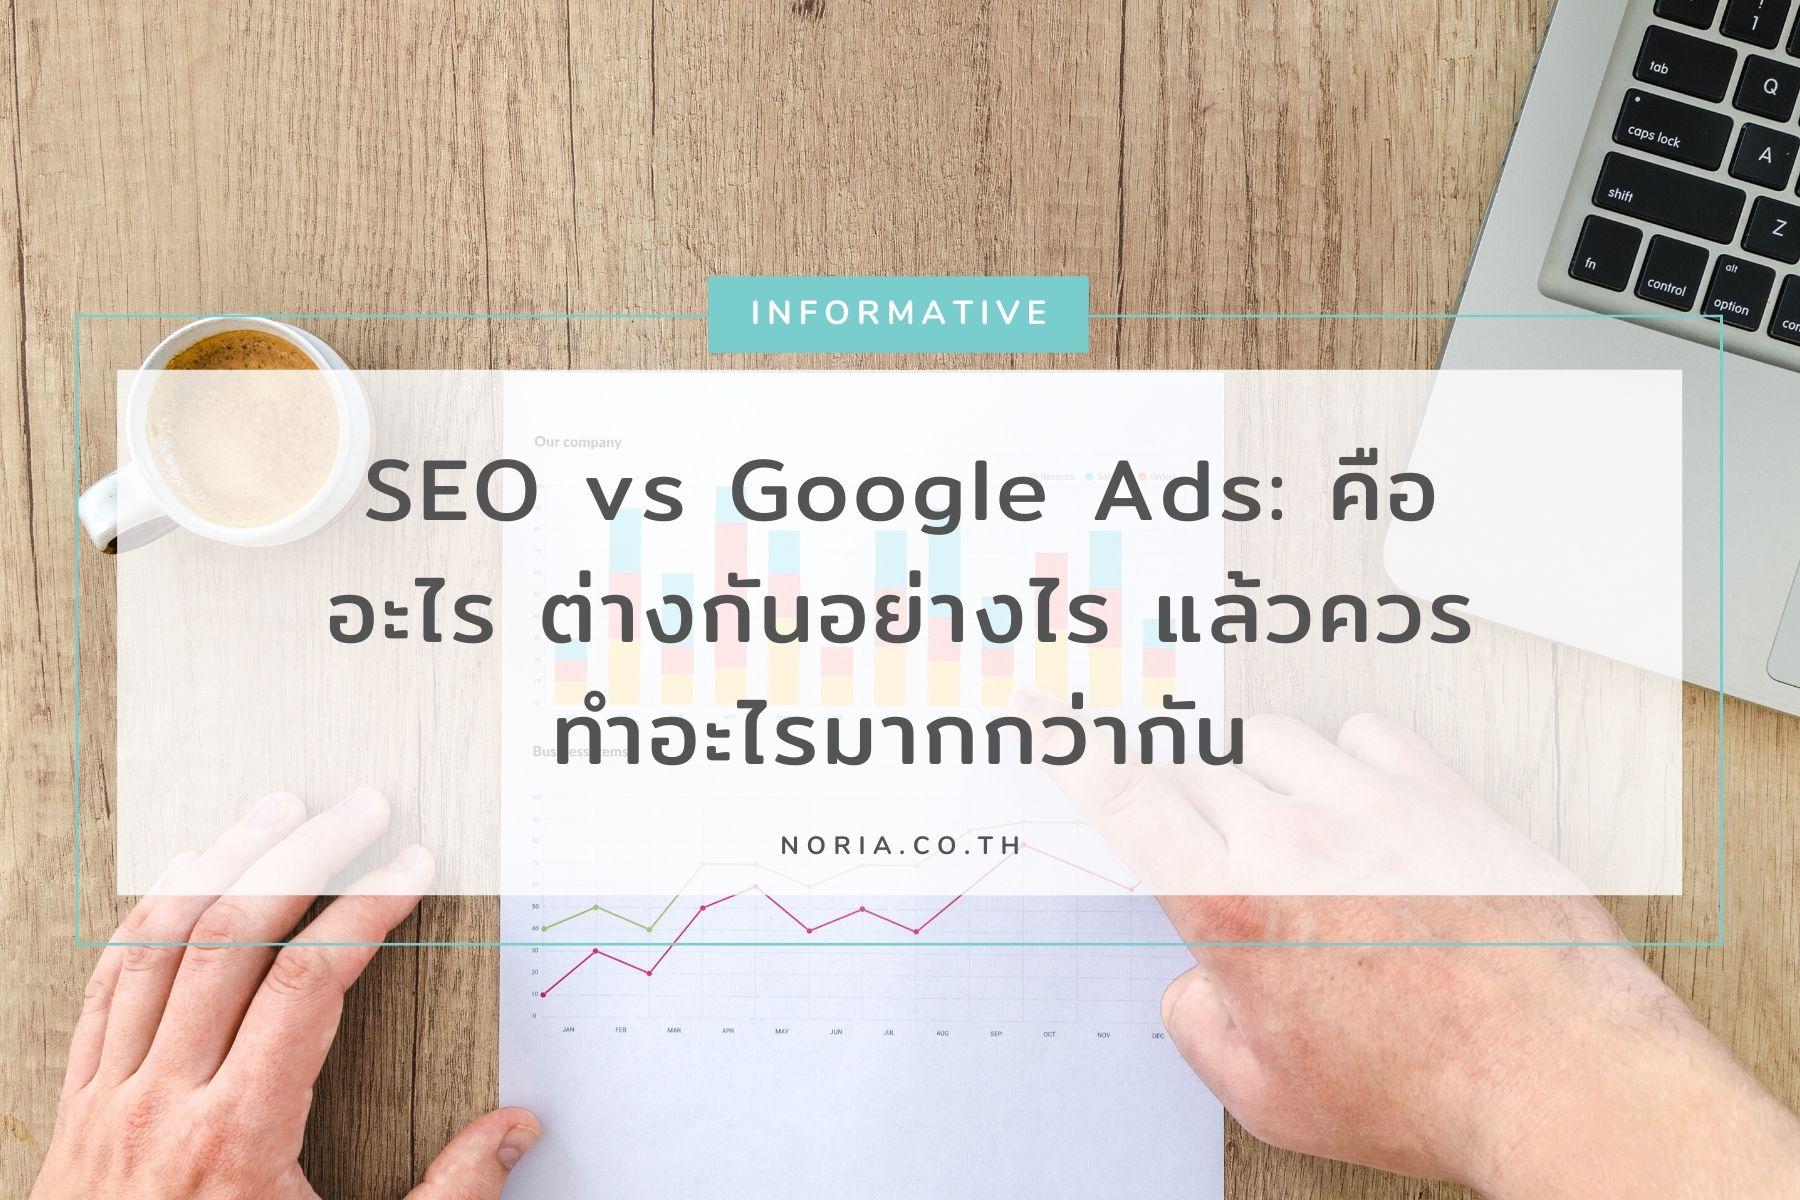 SEO กับ Google Ads ต่างกันยังไง